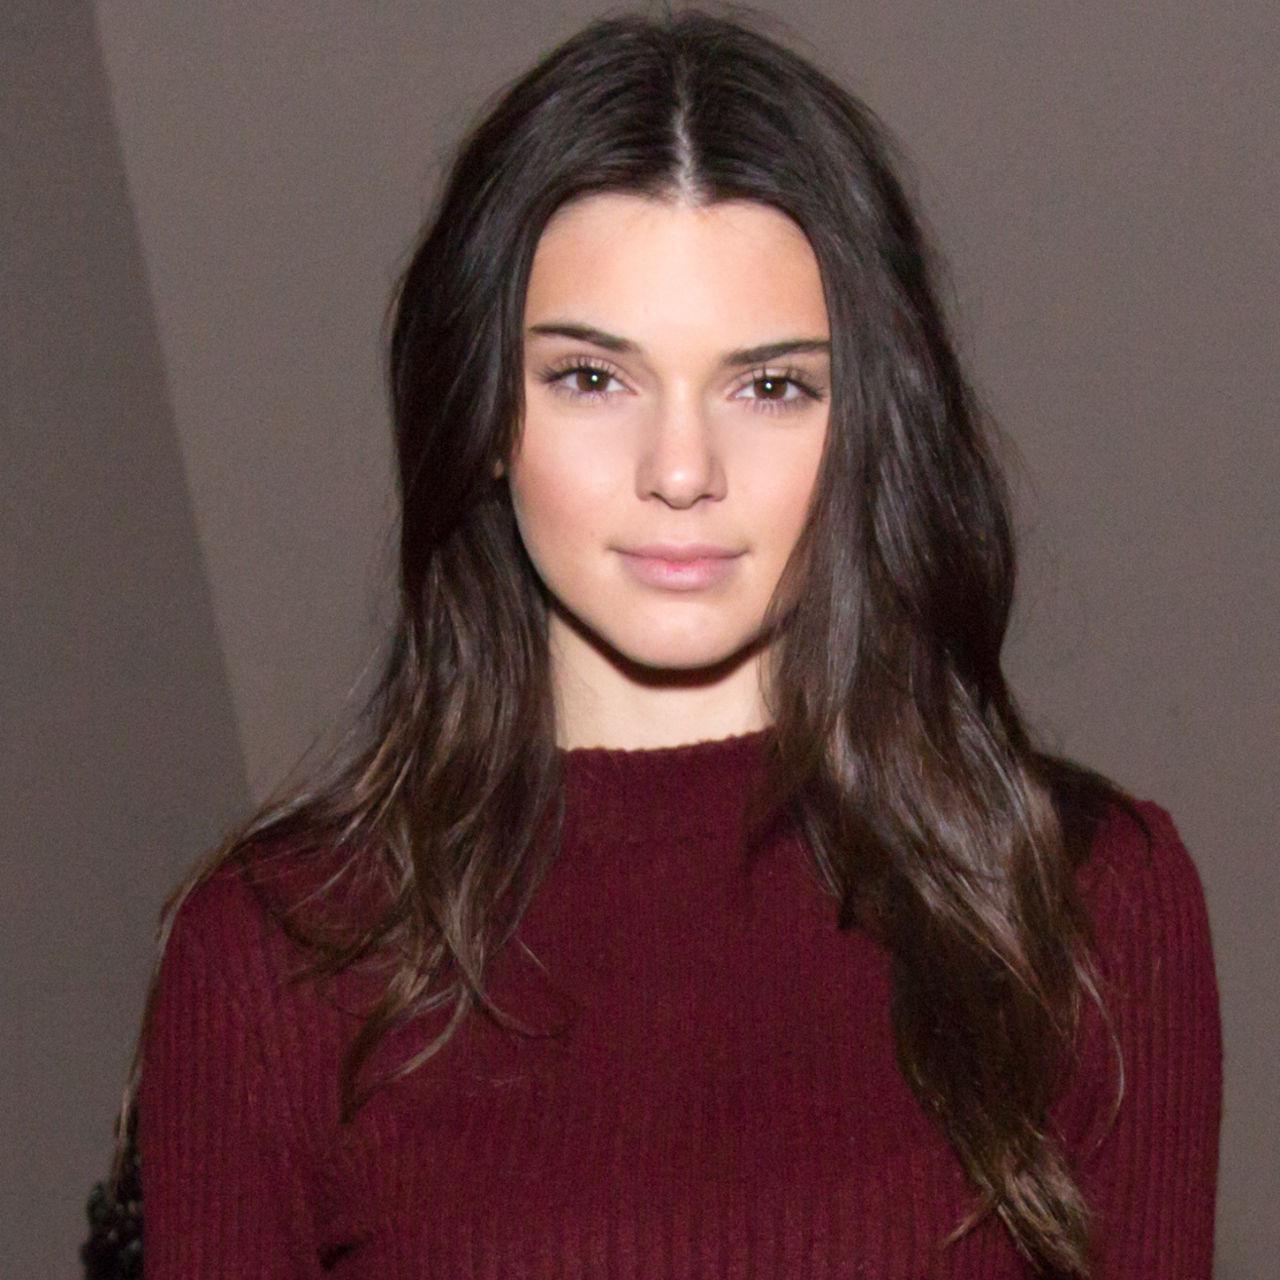 kim kardashian straight hairstyles : ... Kendall Jenner Haircut - Justin Bieber Video of Kendall Jenner Haircut